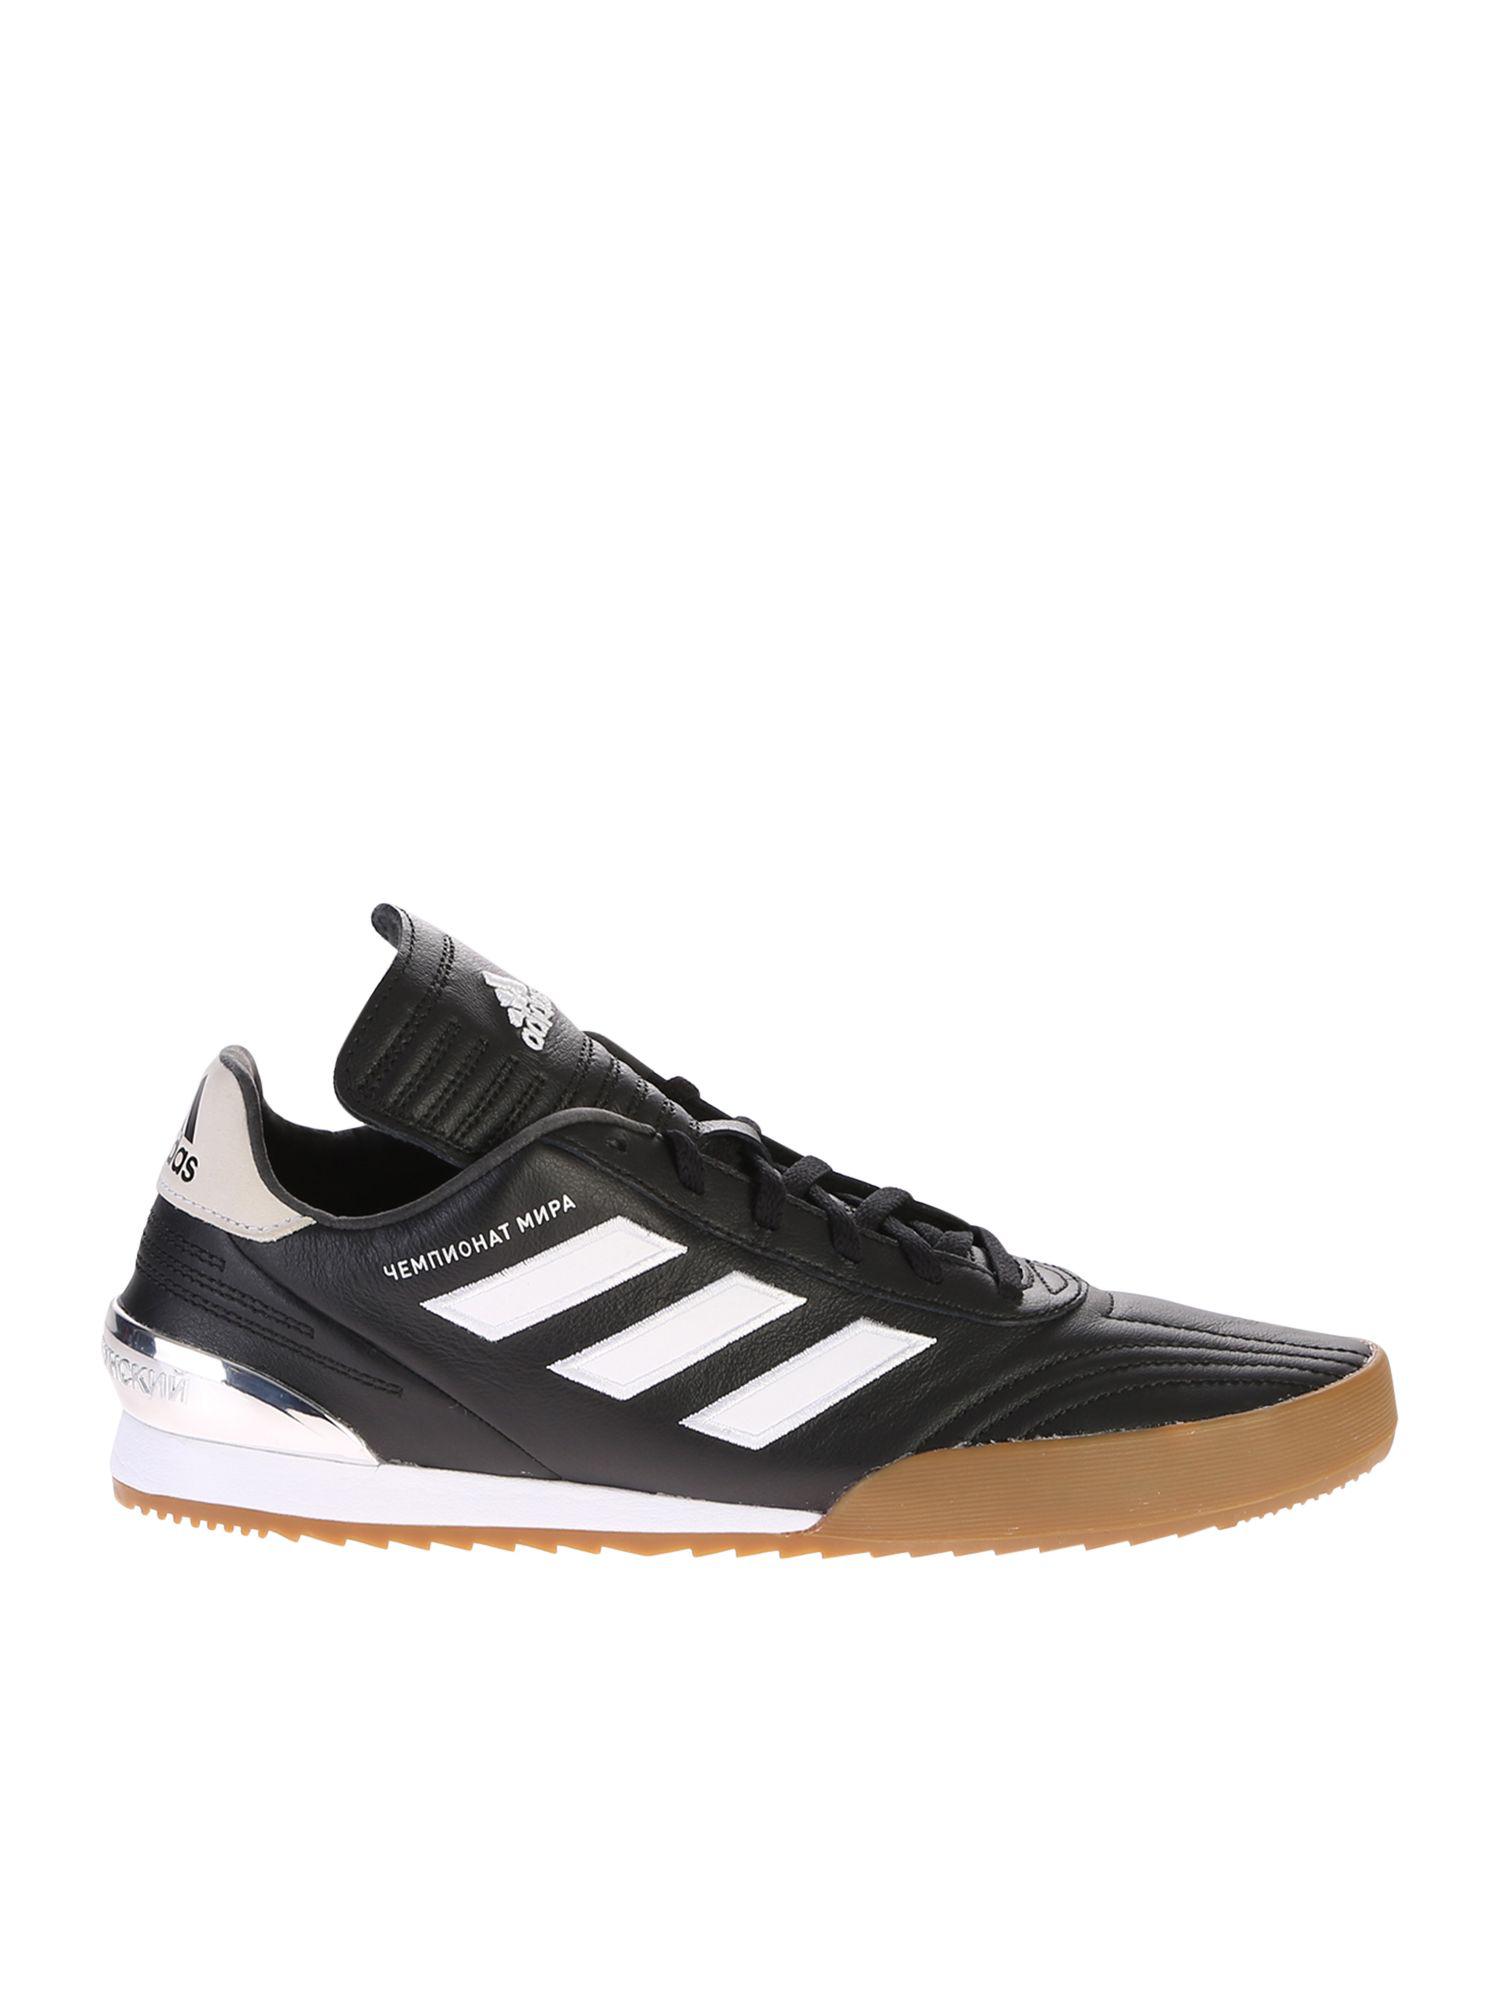 700287696d38d Gosha Rubchinskiy Copa Super Leather Sneakers - Black